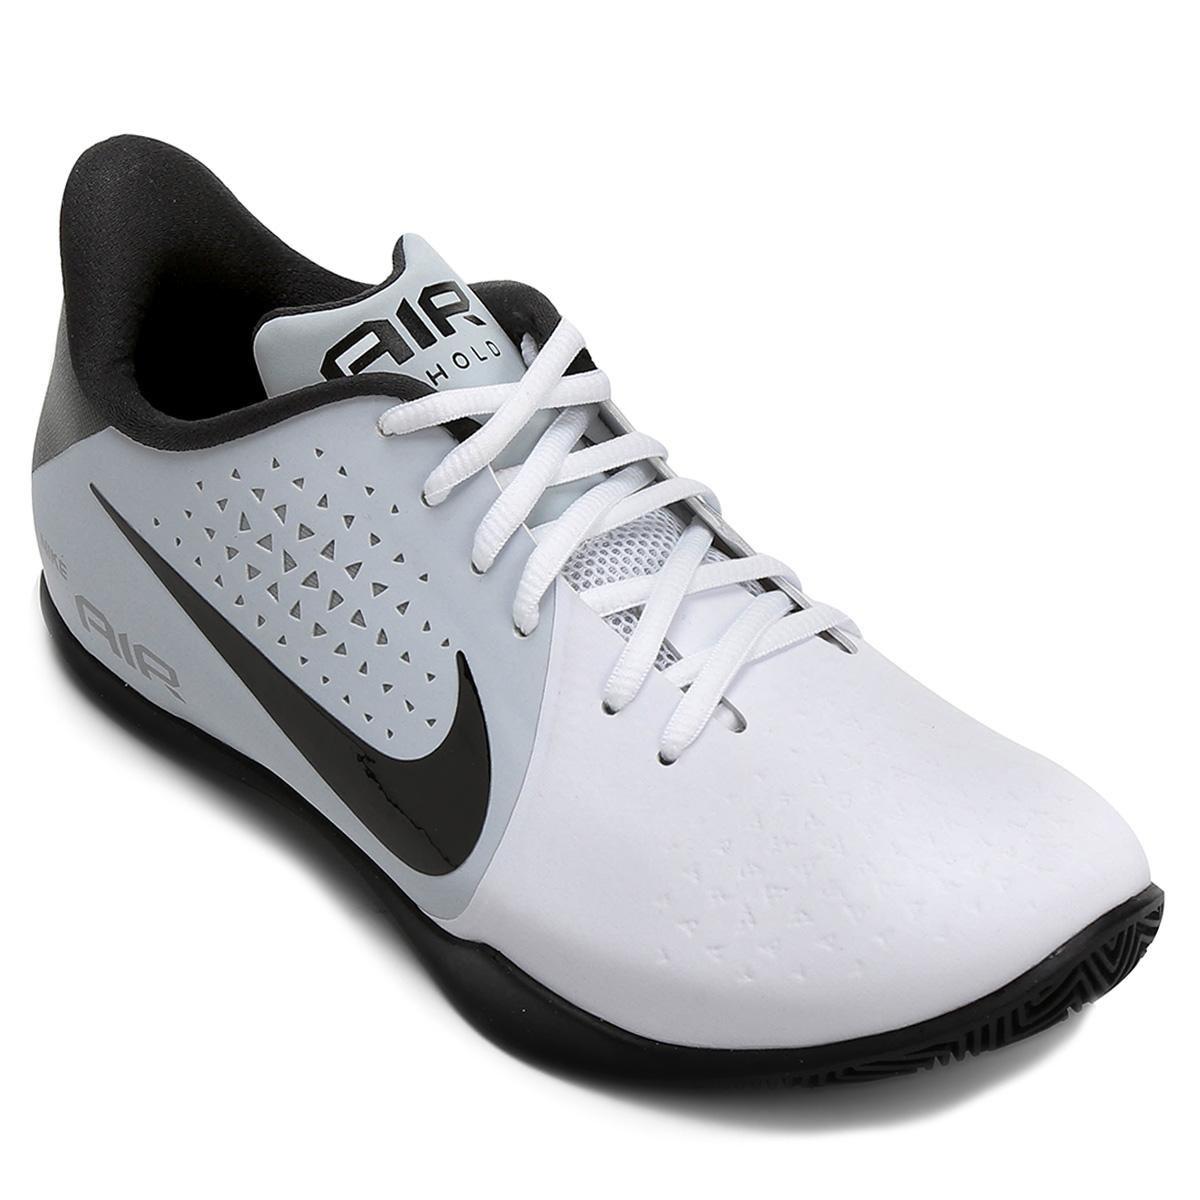 Tênis Nike Air Behold Low Masculino - Branco e Preto - Compre Agora ... c04a03ce641ab